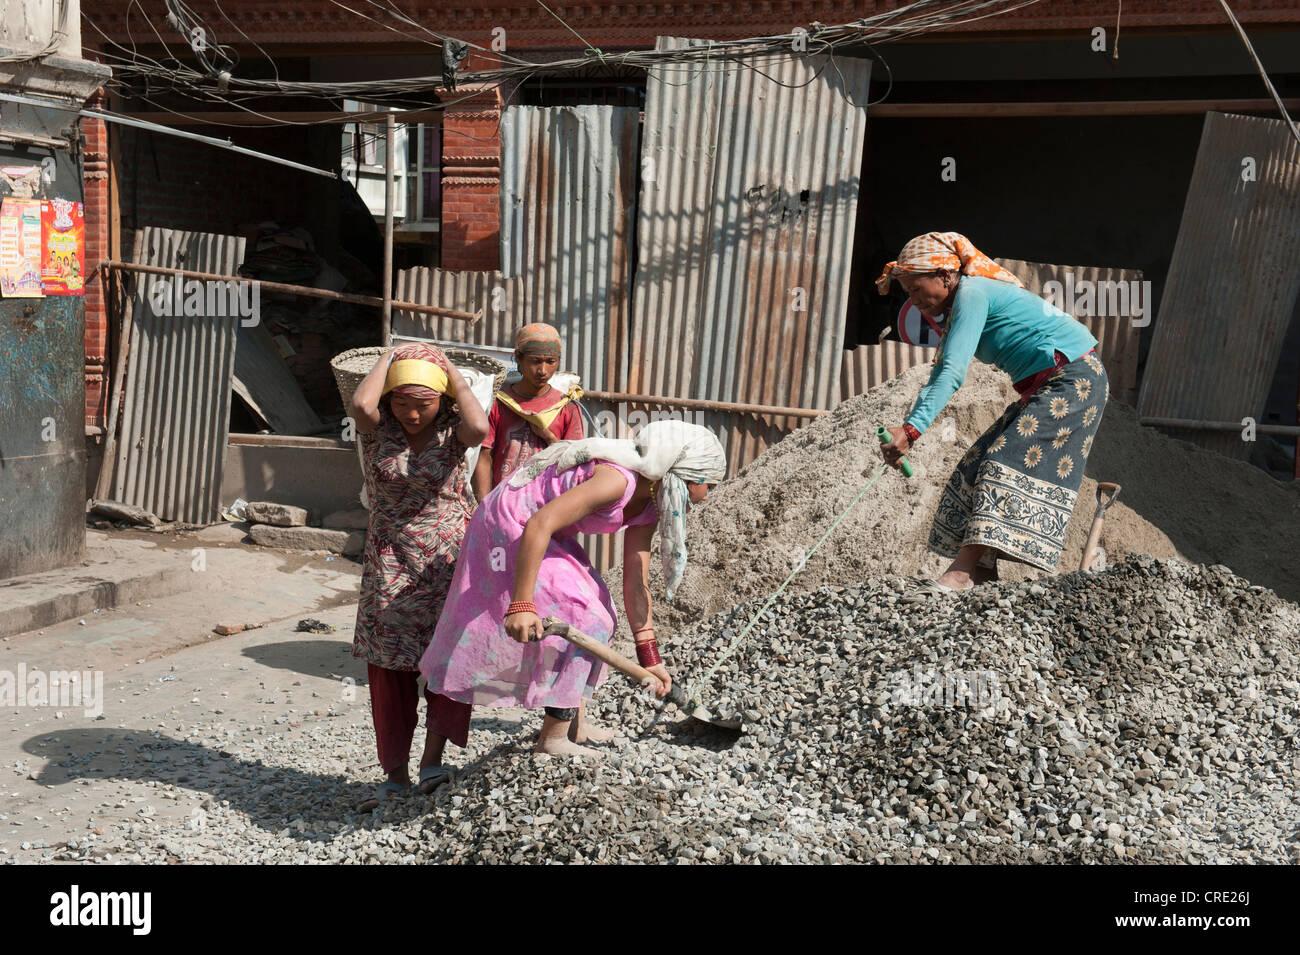 Hard physical labor, construction workers shoveling gravel with shovels, Durbar Square, Kathmandu, Kathmandu Valley, - Stock Image